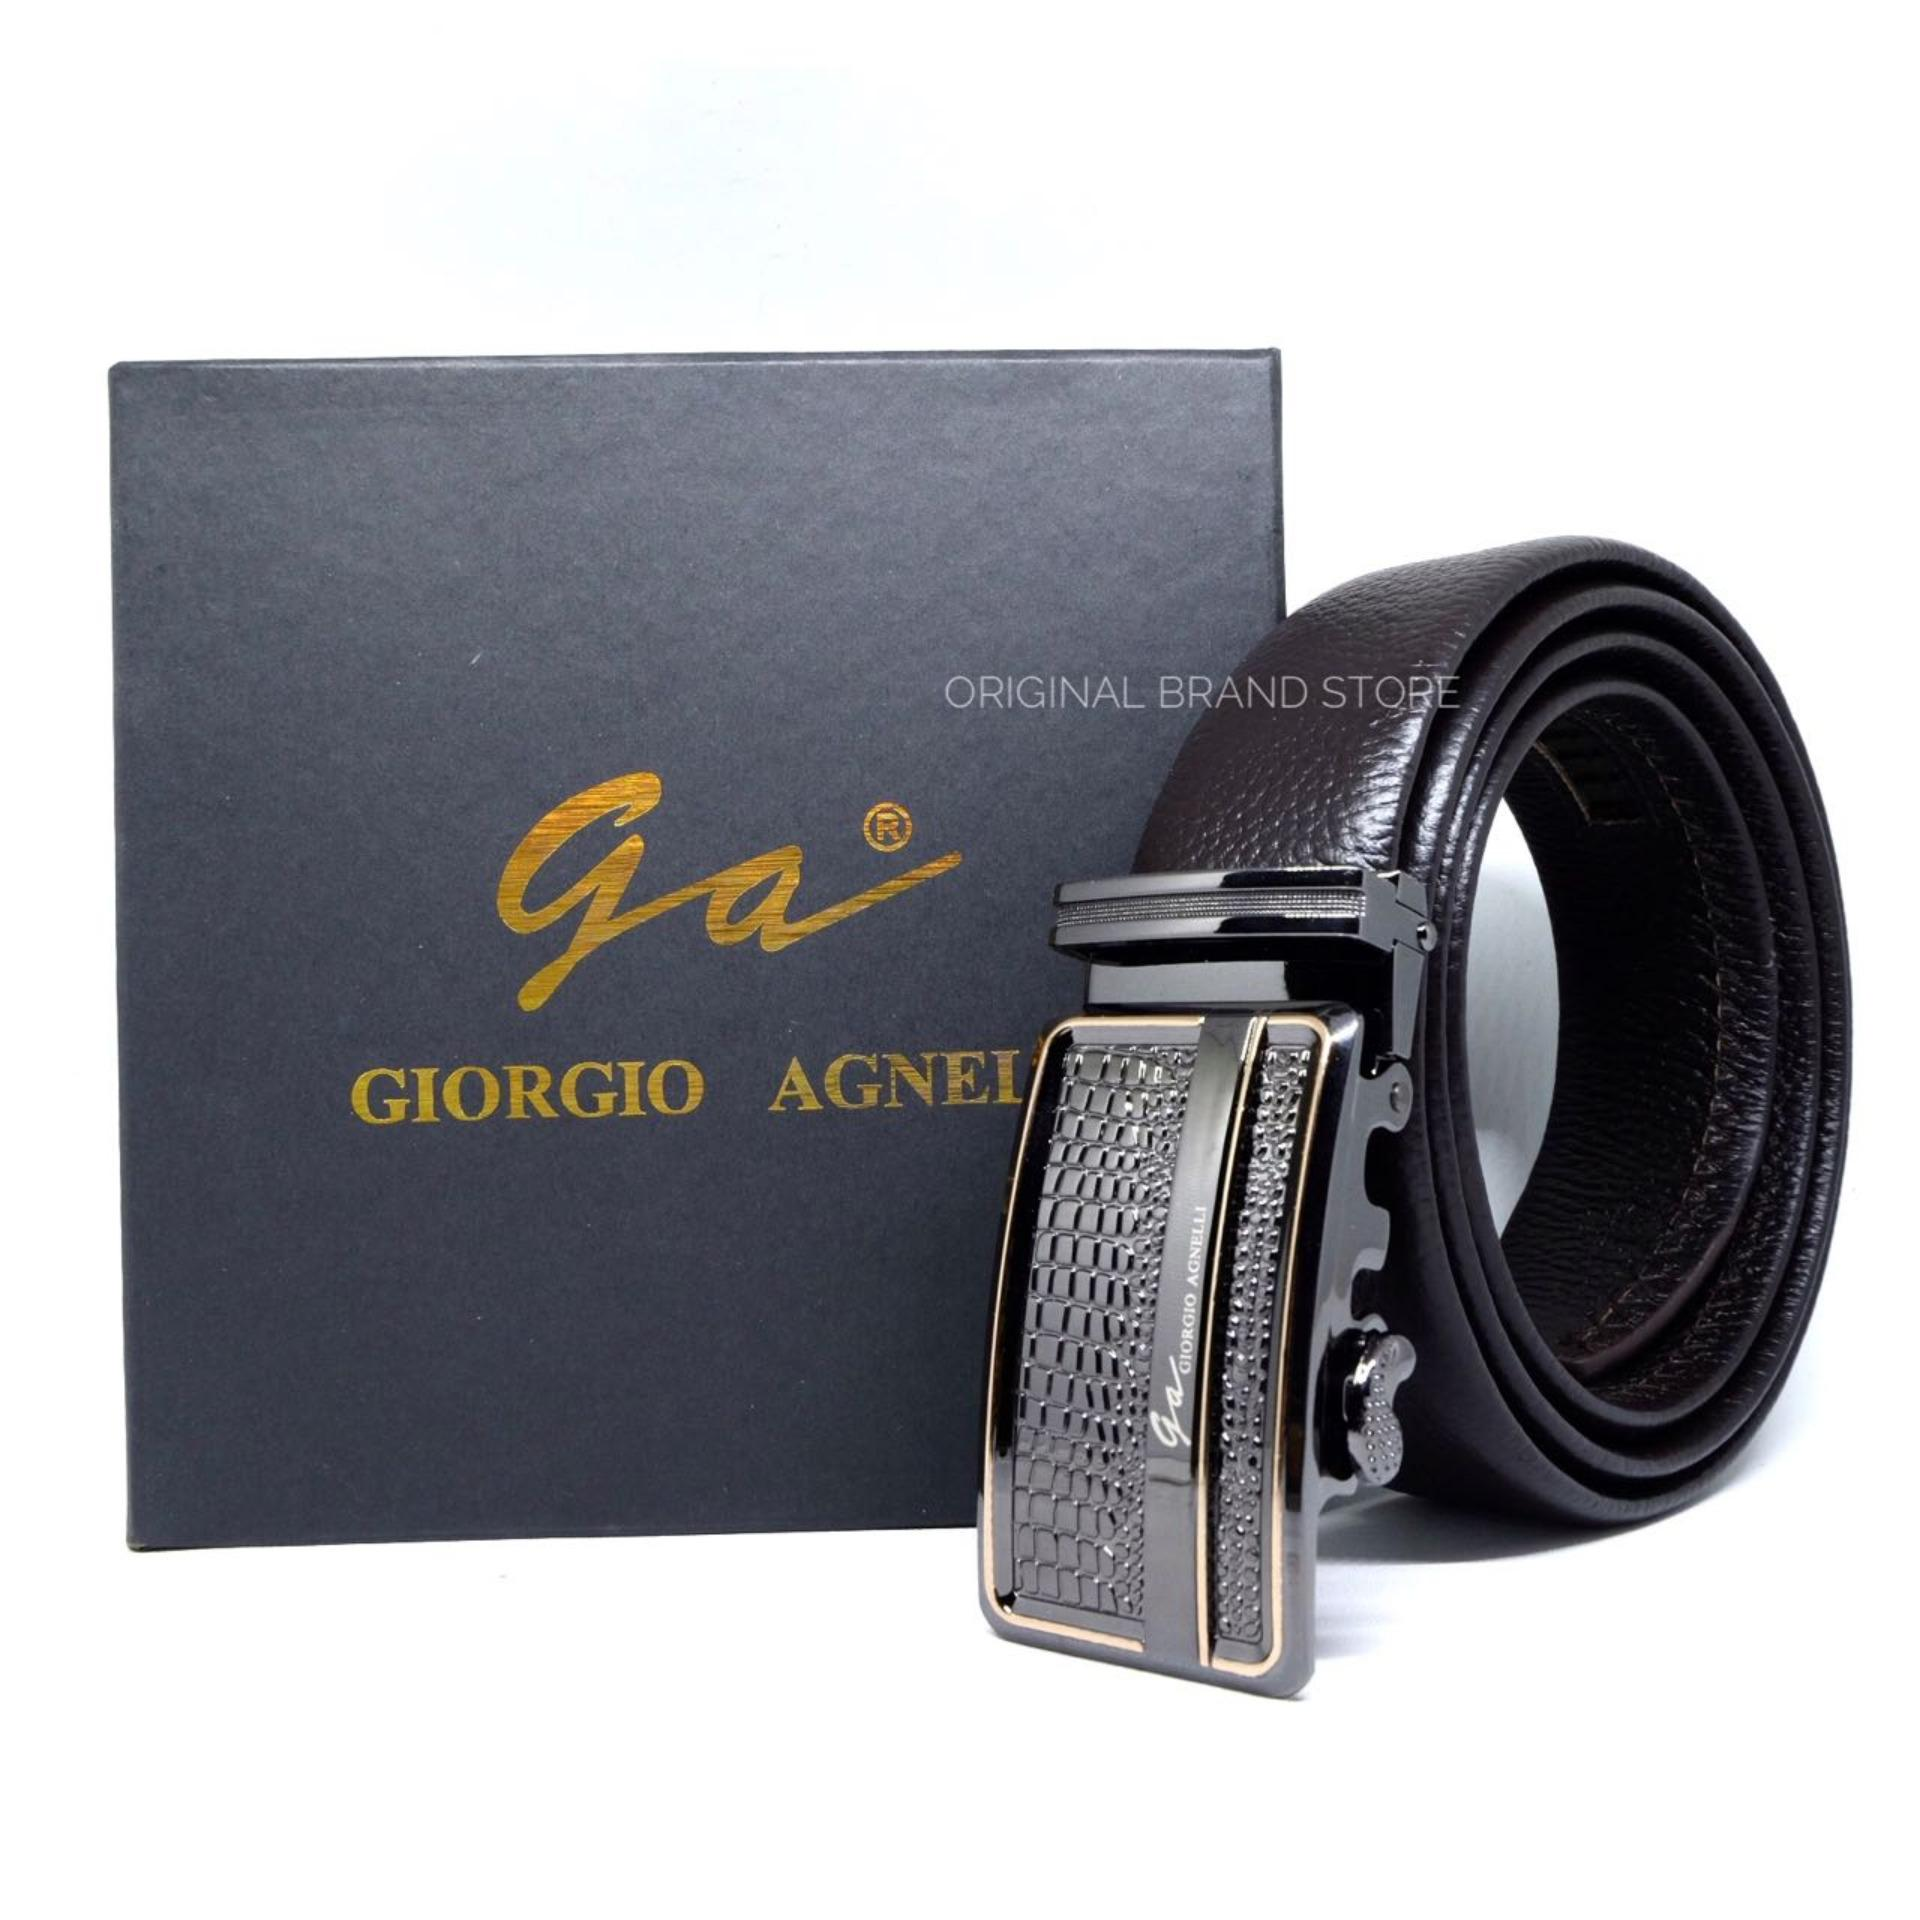 Jual Giorgio Agnelli Original Gesper Sabuk Pria Ikat Pinggang Kulit Asli Pria Rel Otomatis 90R Giorgio Agnelli Ori